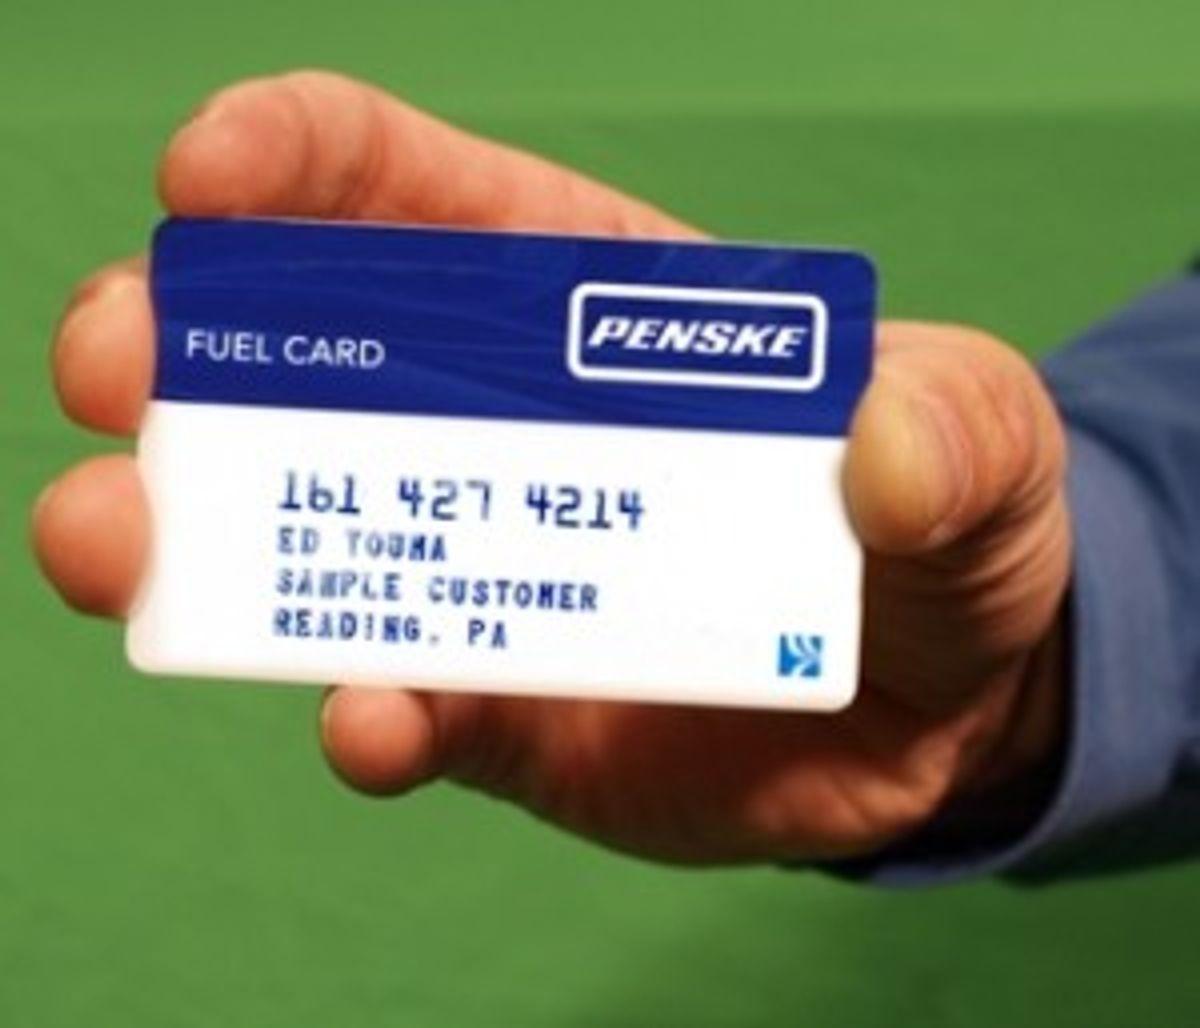 Existing Penske Truck Leasing Fuel Cards Deactivated July 31